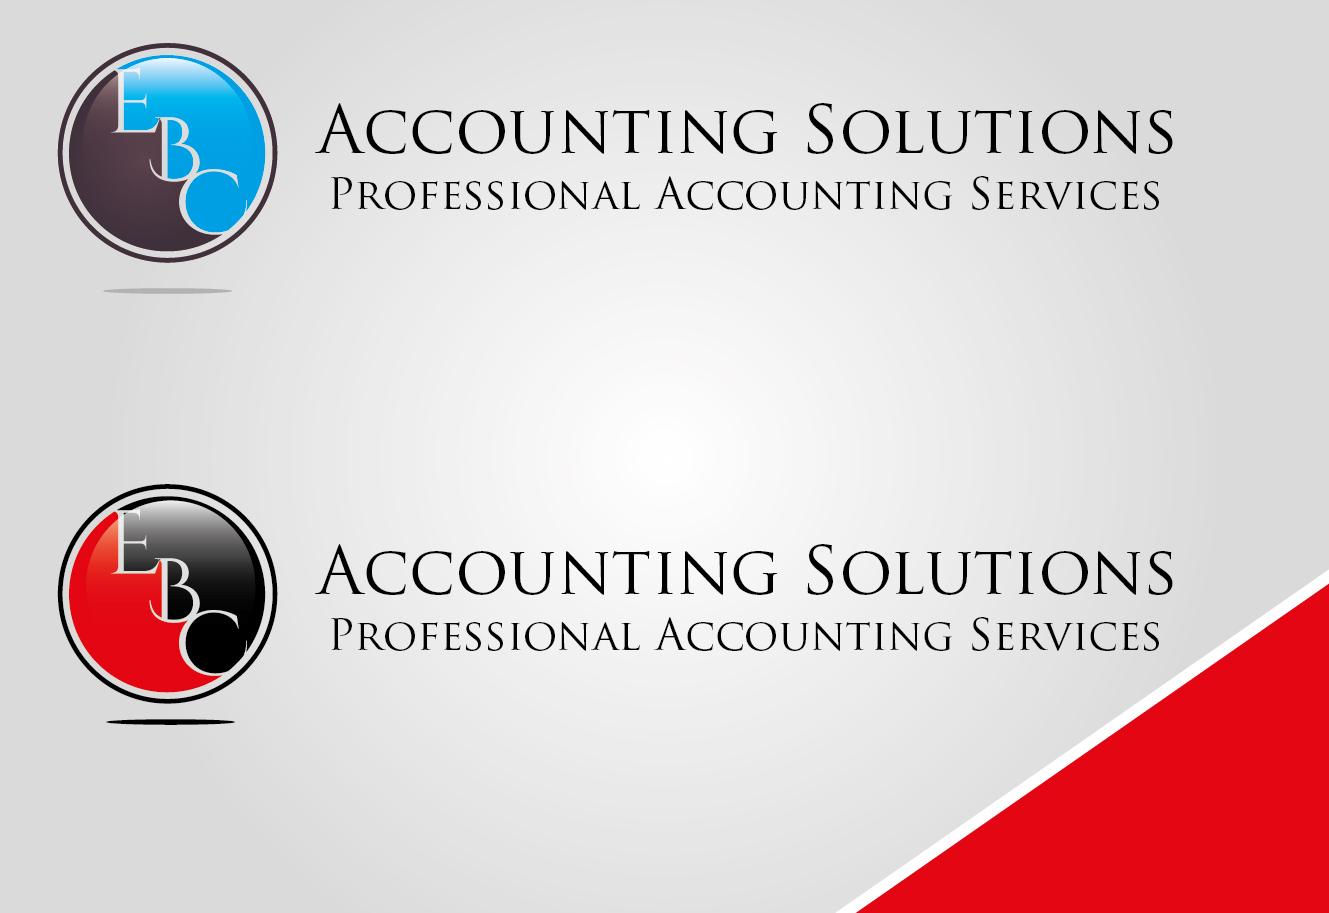 Logo Design by VENTSISLAV KOVACHEV - Entry No. 1 in the Logo Design Contest New Logo Design for EBC Accounting Solutions.